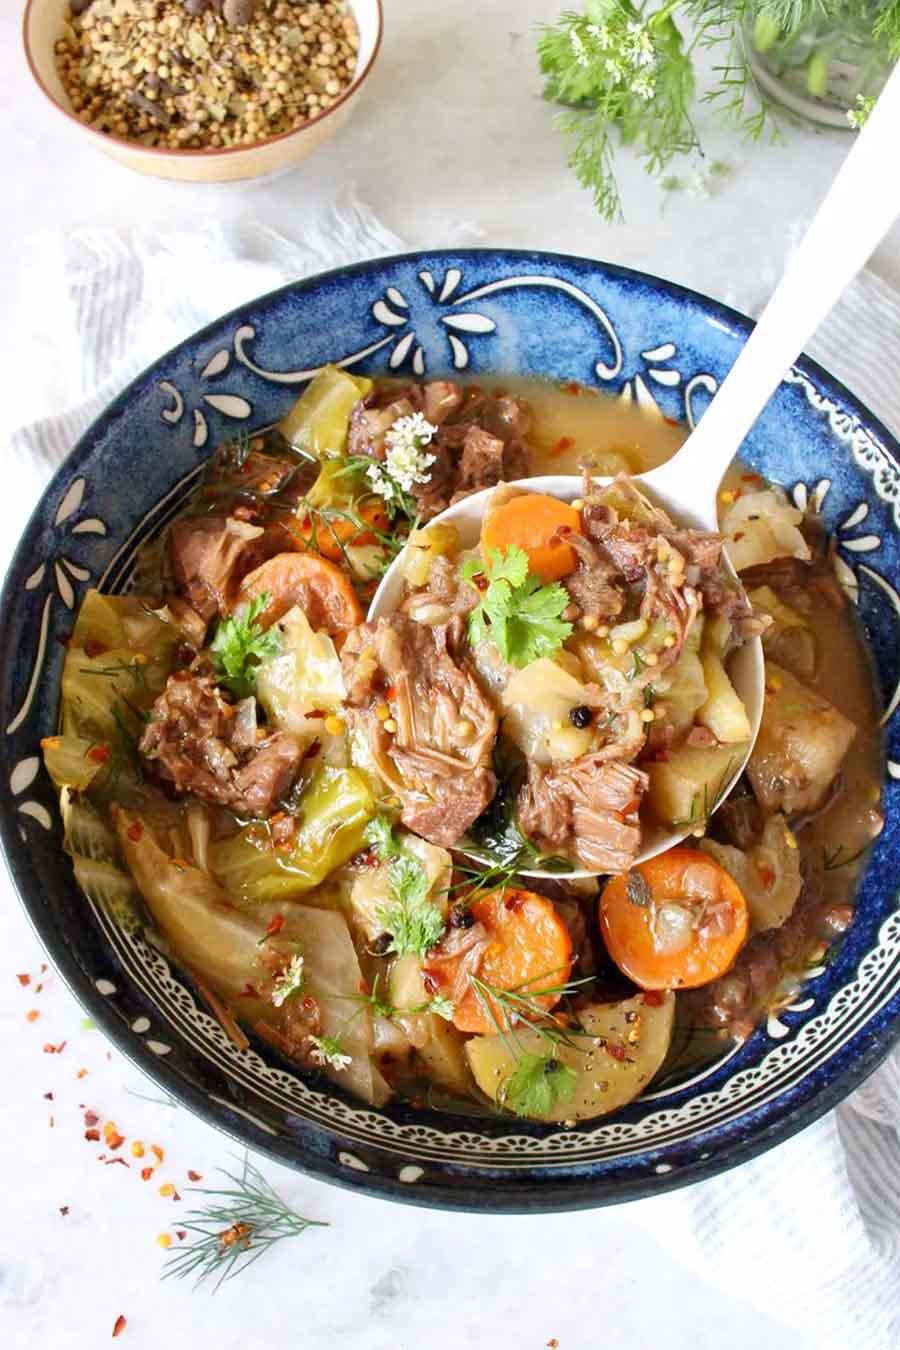 Bowl of vegan corned jackfruit and cabbage